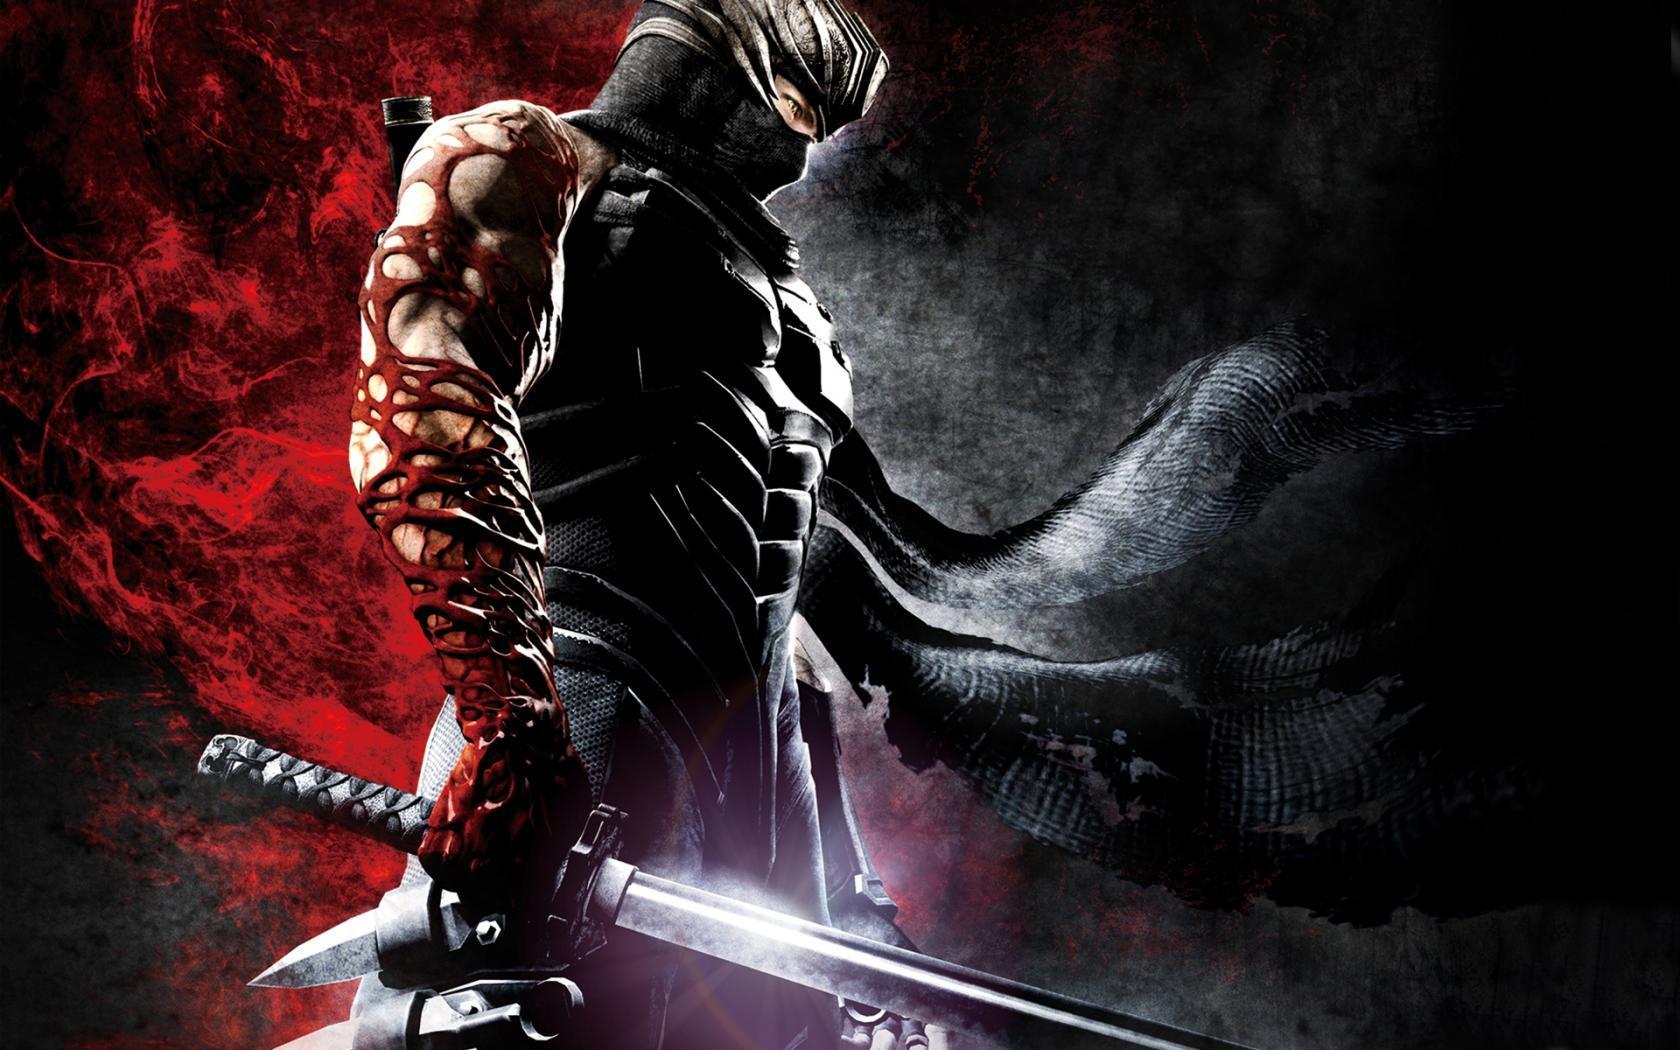 1680x1050 Danger Man HD - Ninja Gaiden 3 - Hình nền HD